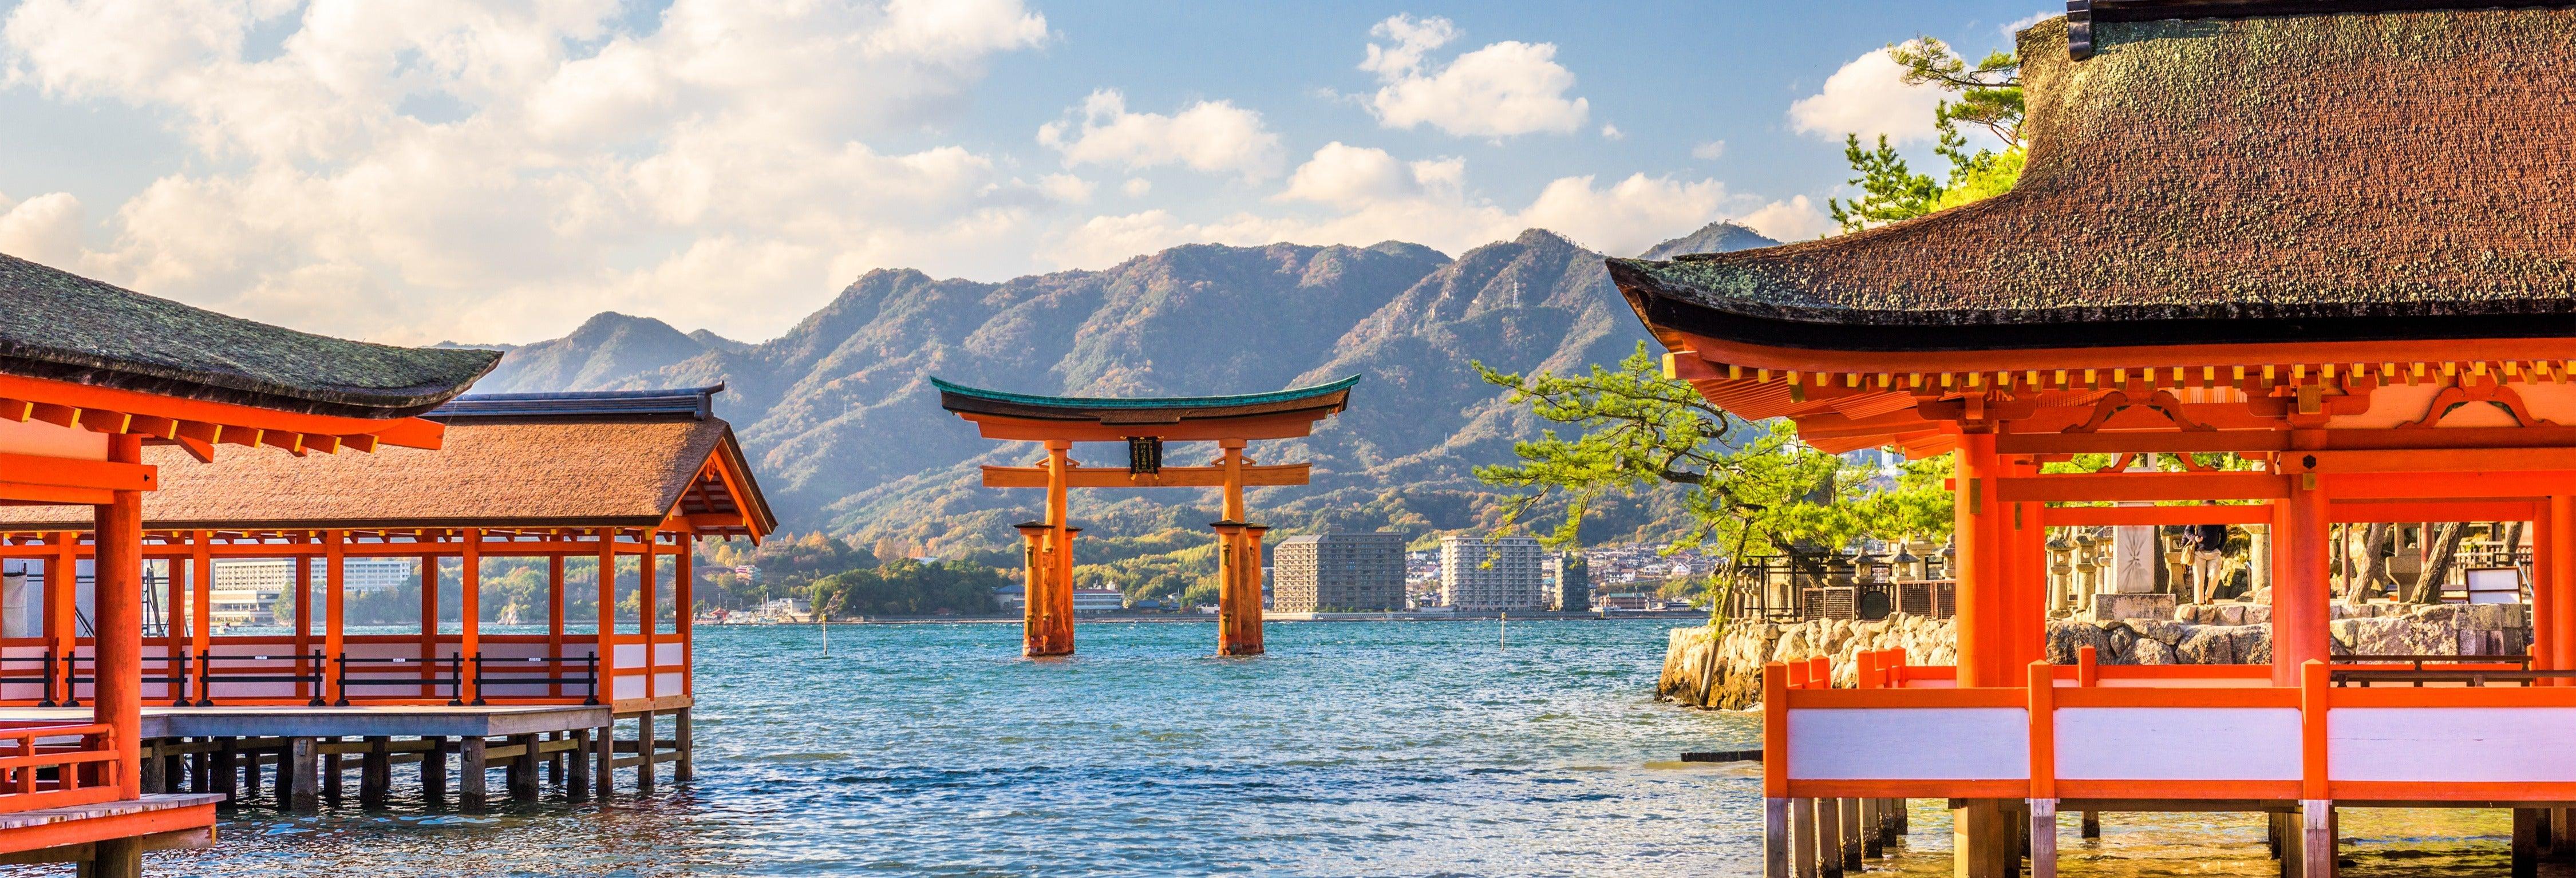 Tour por Hiroshima y Miyajima